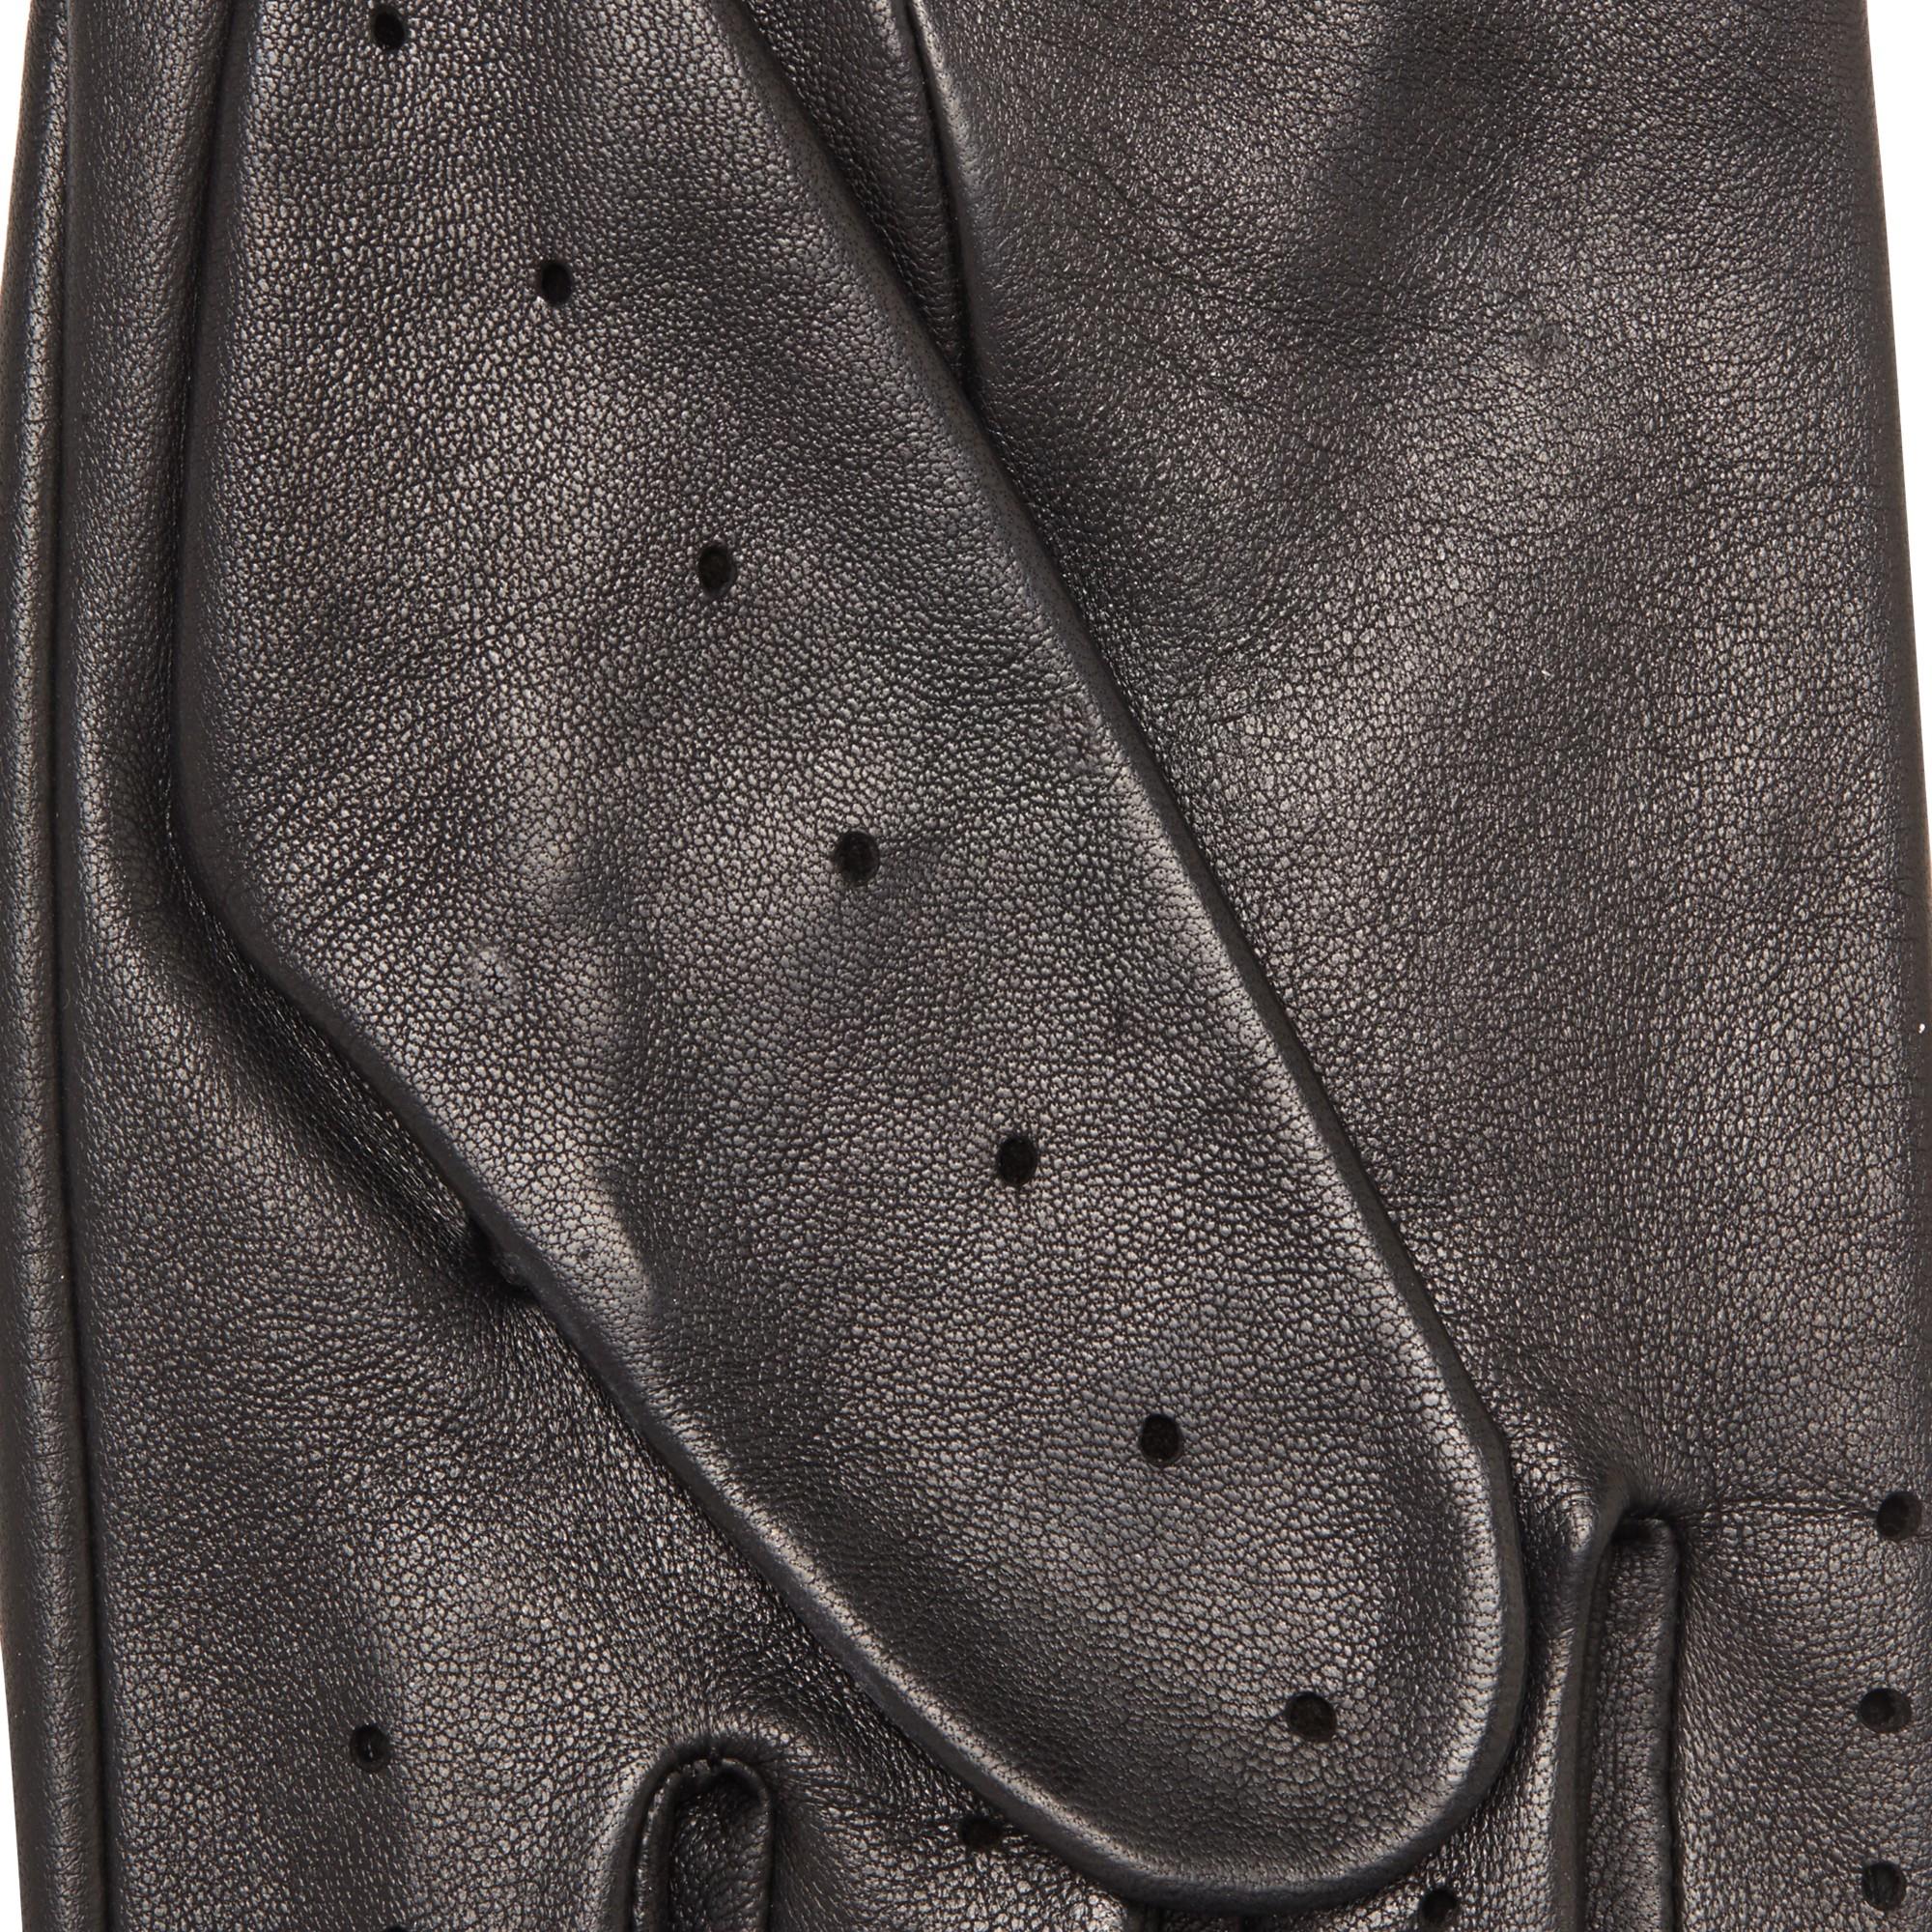 John lewis leather driving gloves - John Lewis Black Leather Driving Glove For Men Lyst View Fullscreen